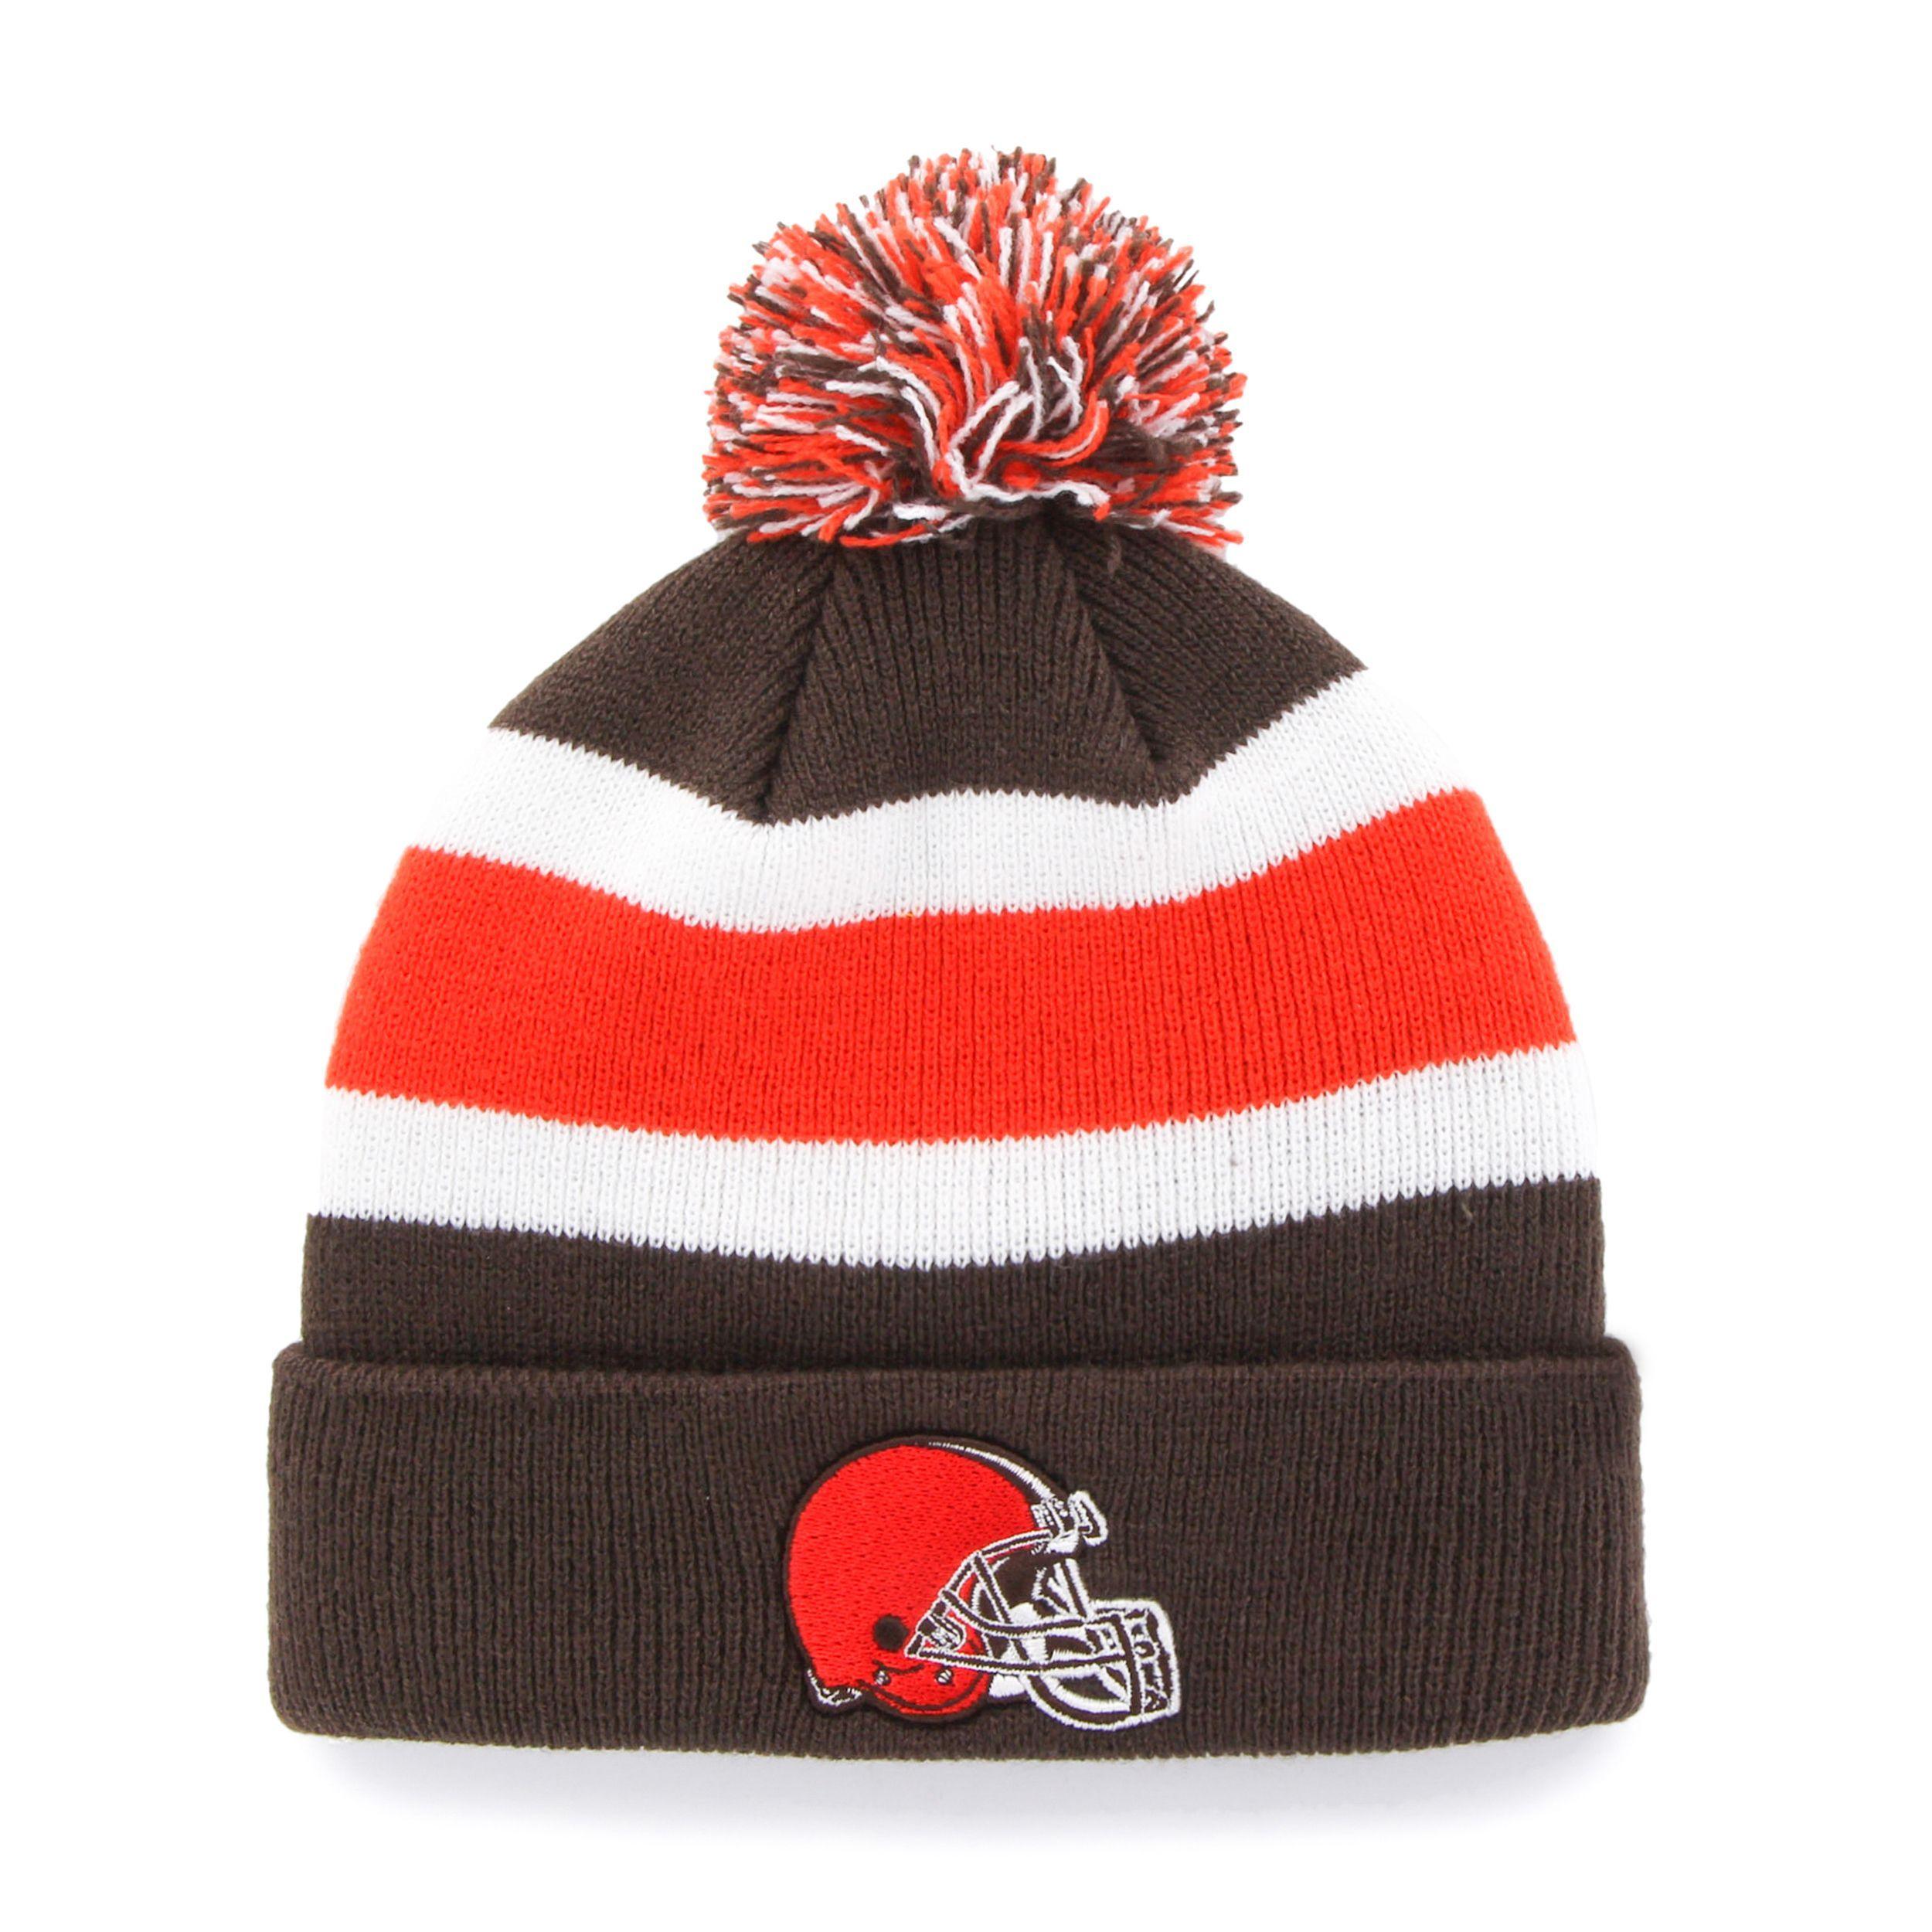 30451f70 47 Brand Cleveland Browns Breakaway Beanie Hat (Cleveland Browns ...